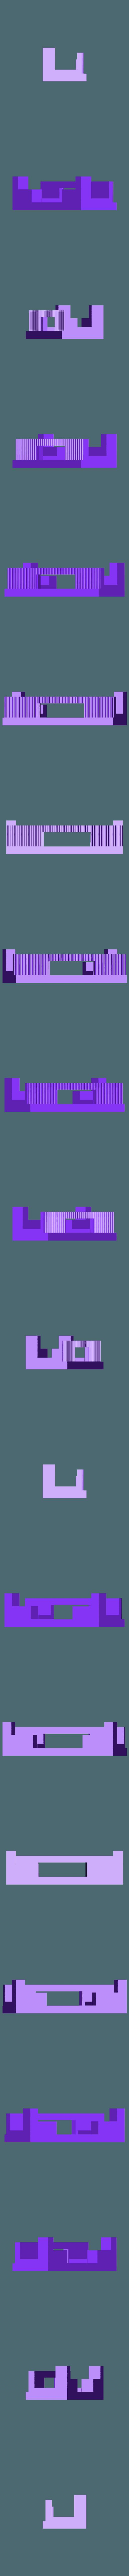 PCB_2_v57_PCB_2_v57_Component19_1_Body35_Component19_1.stl Télécharger fichier STL gratuit Cyclone PCB Factory Dual Z-axis • Objet pour impression 3D, TinkersProjects